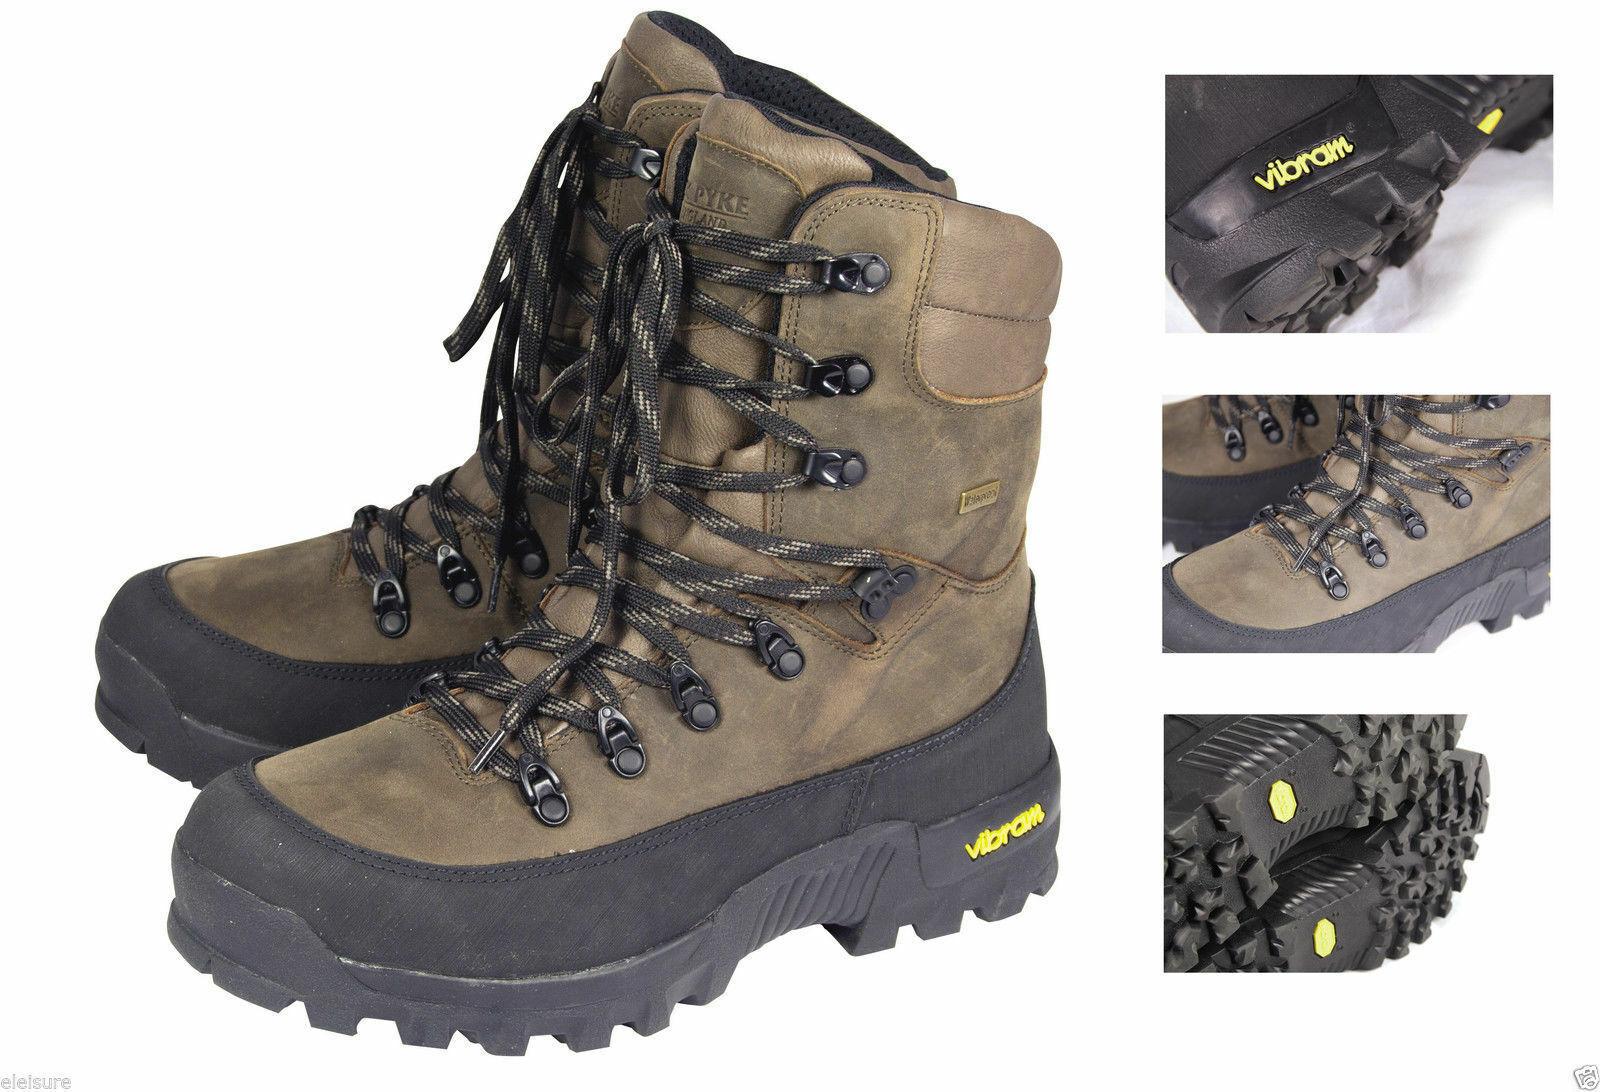 botas Jack Pyke Cazadores De Cuero Impermeable Caza botas Soporte De Tobillo Alto Marca